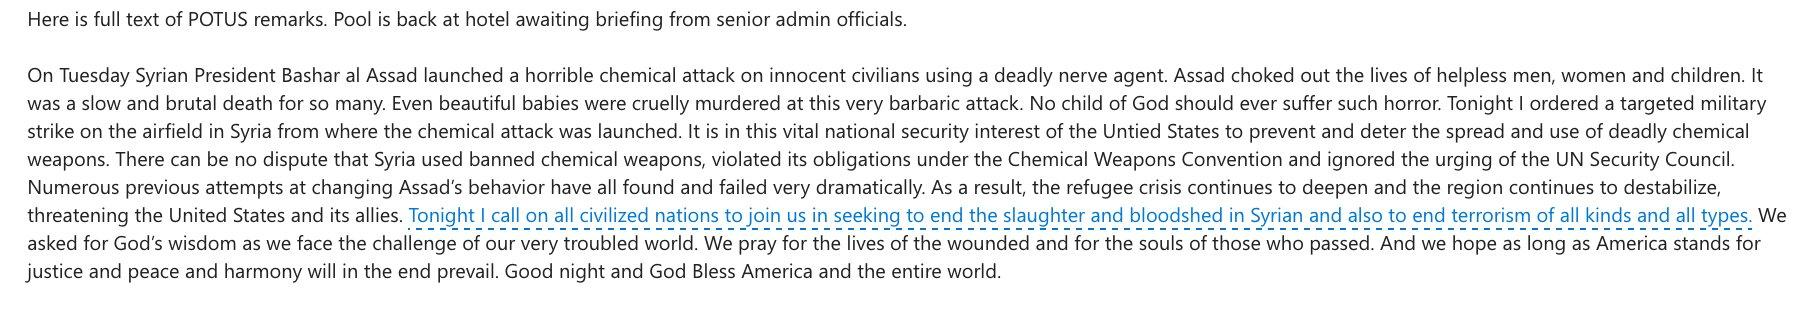 Via pool: Here is full text of @POTUS remarks. https://t.co/jwUNHEelk1